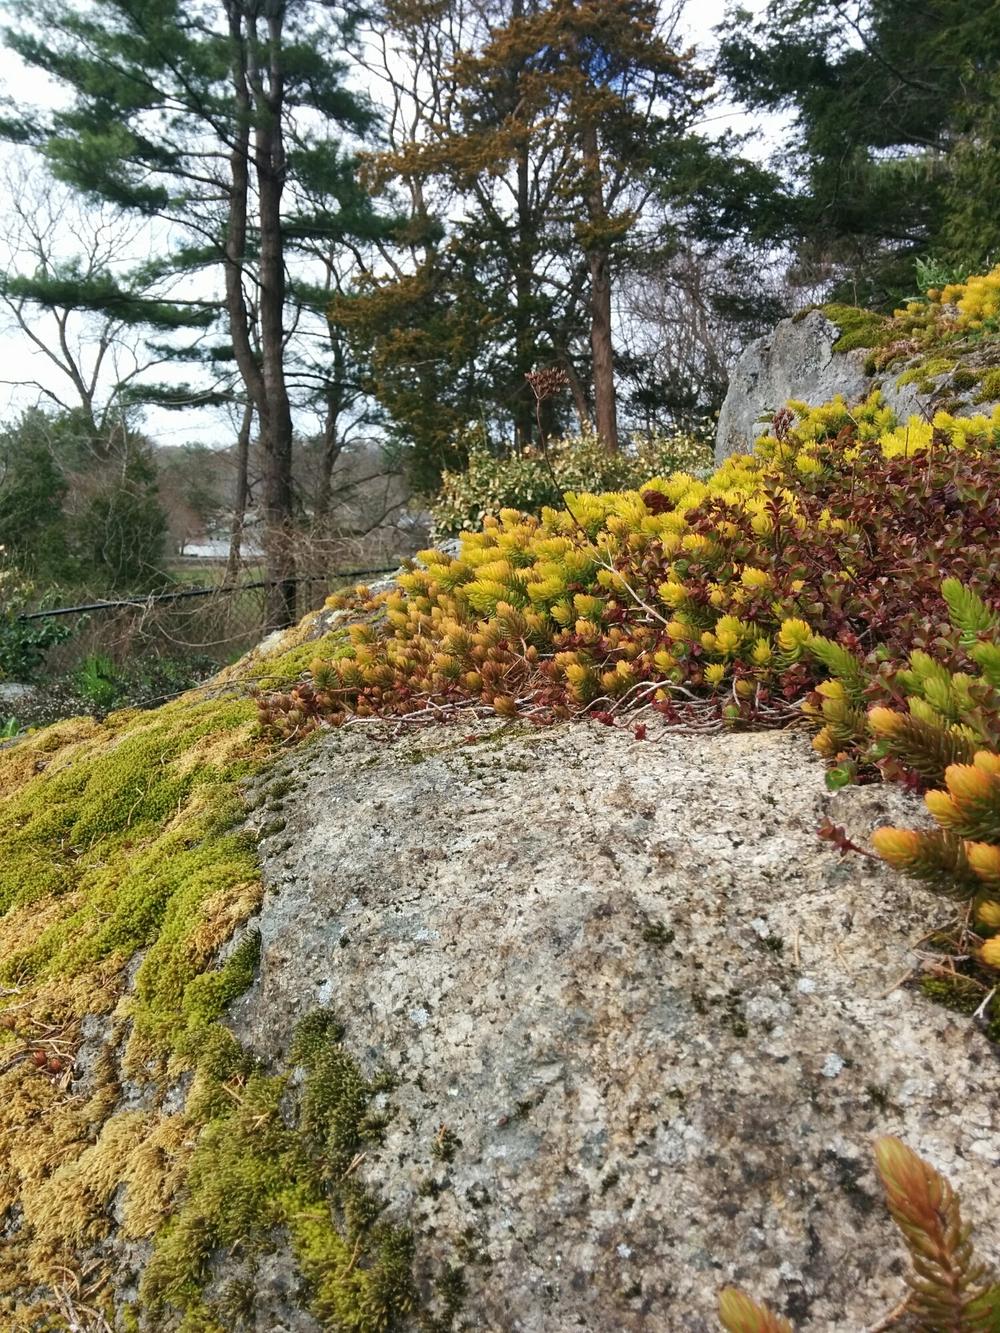 Sedum and moss on ledge.